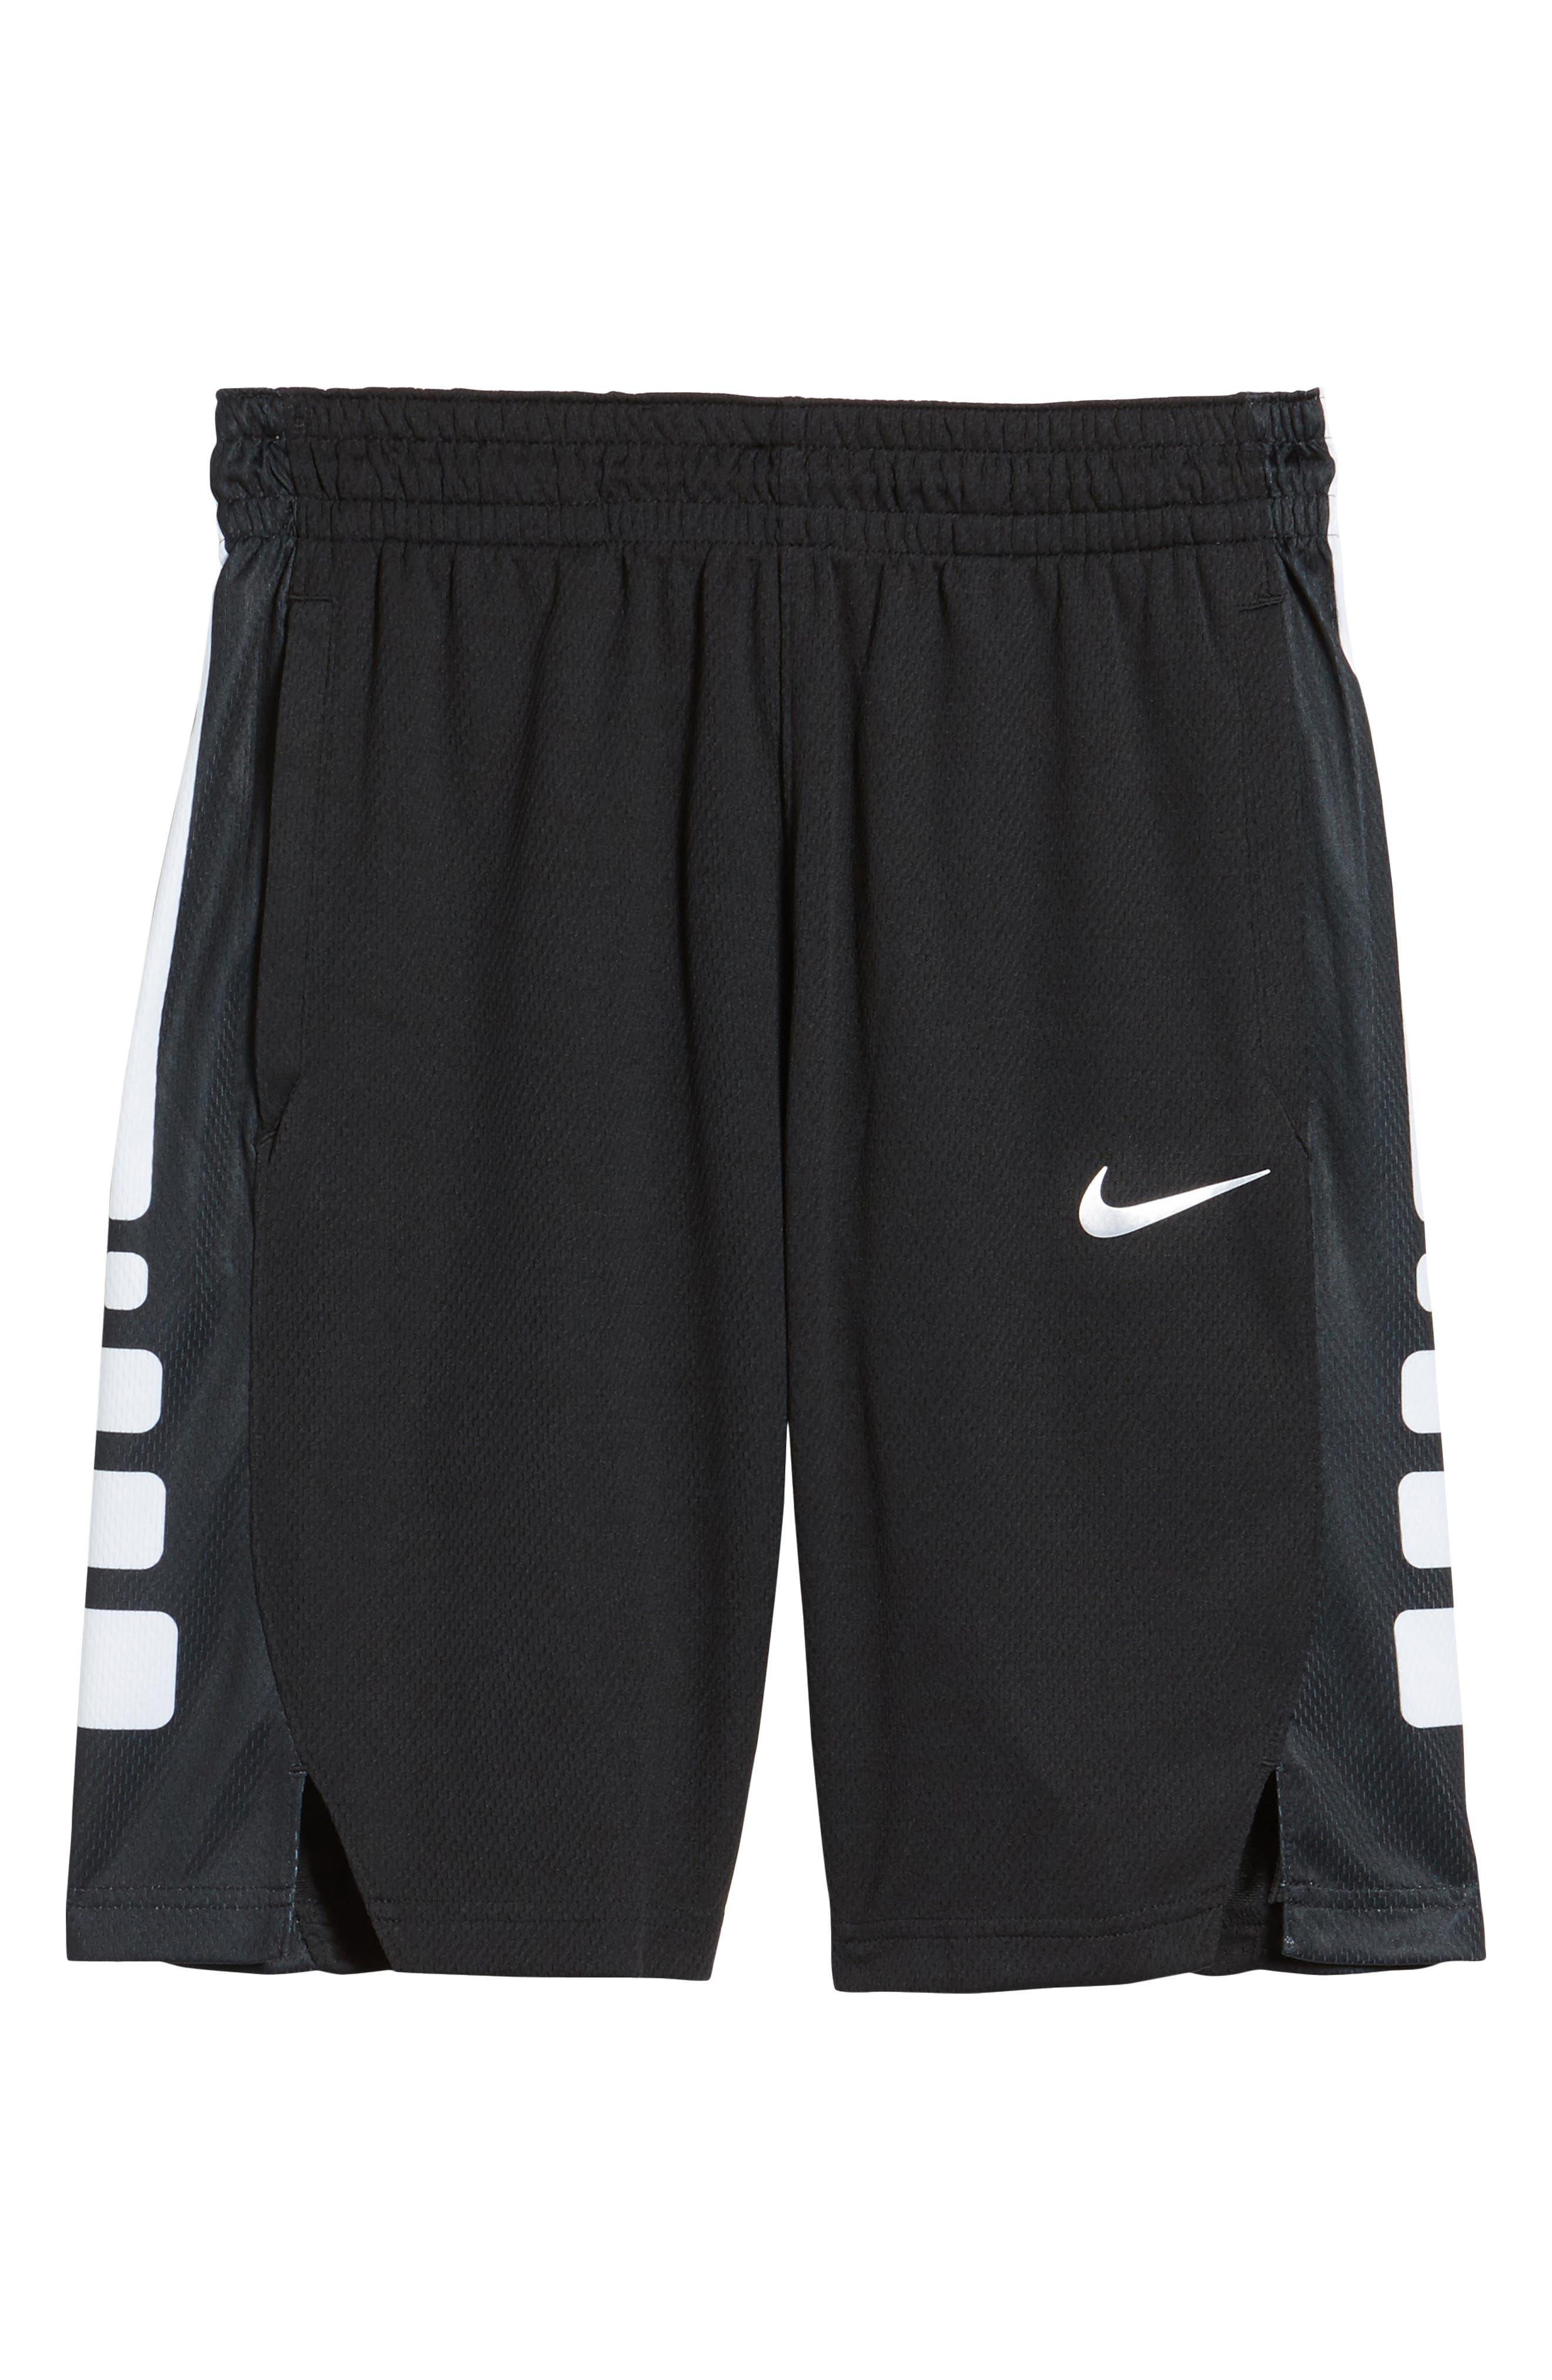 Nike Elite Stripe Basketball Shorts